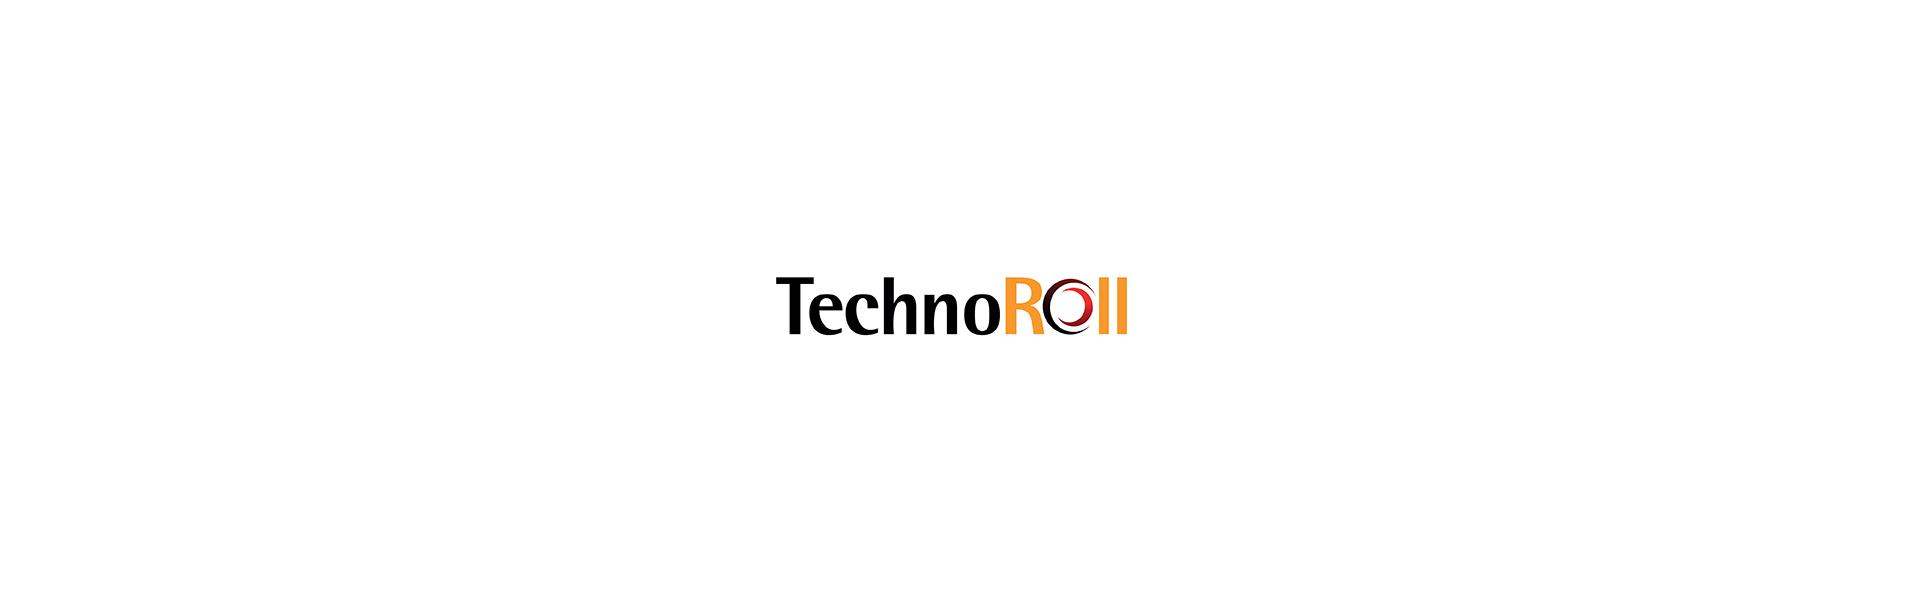 Technoroll Shop